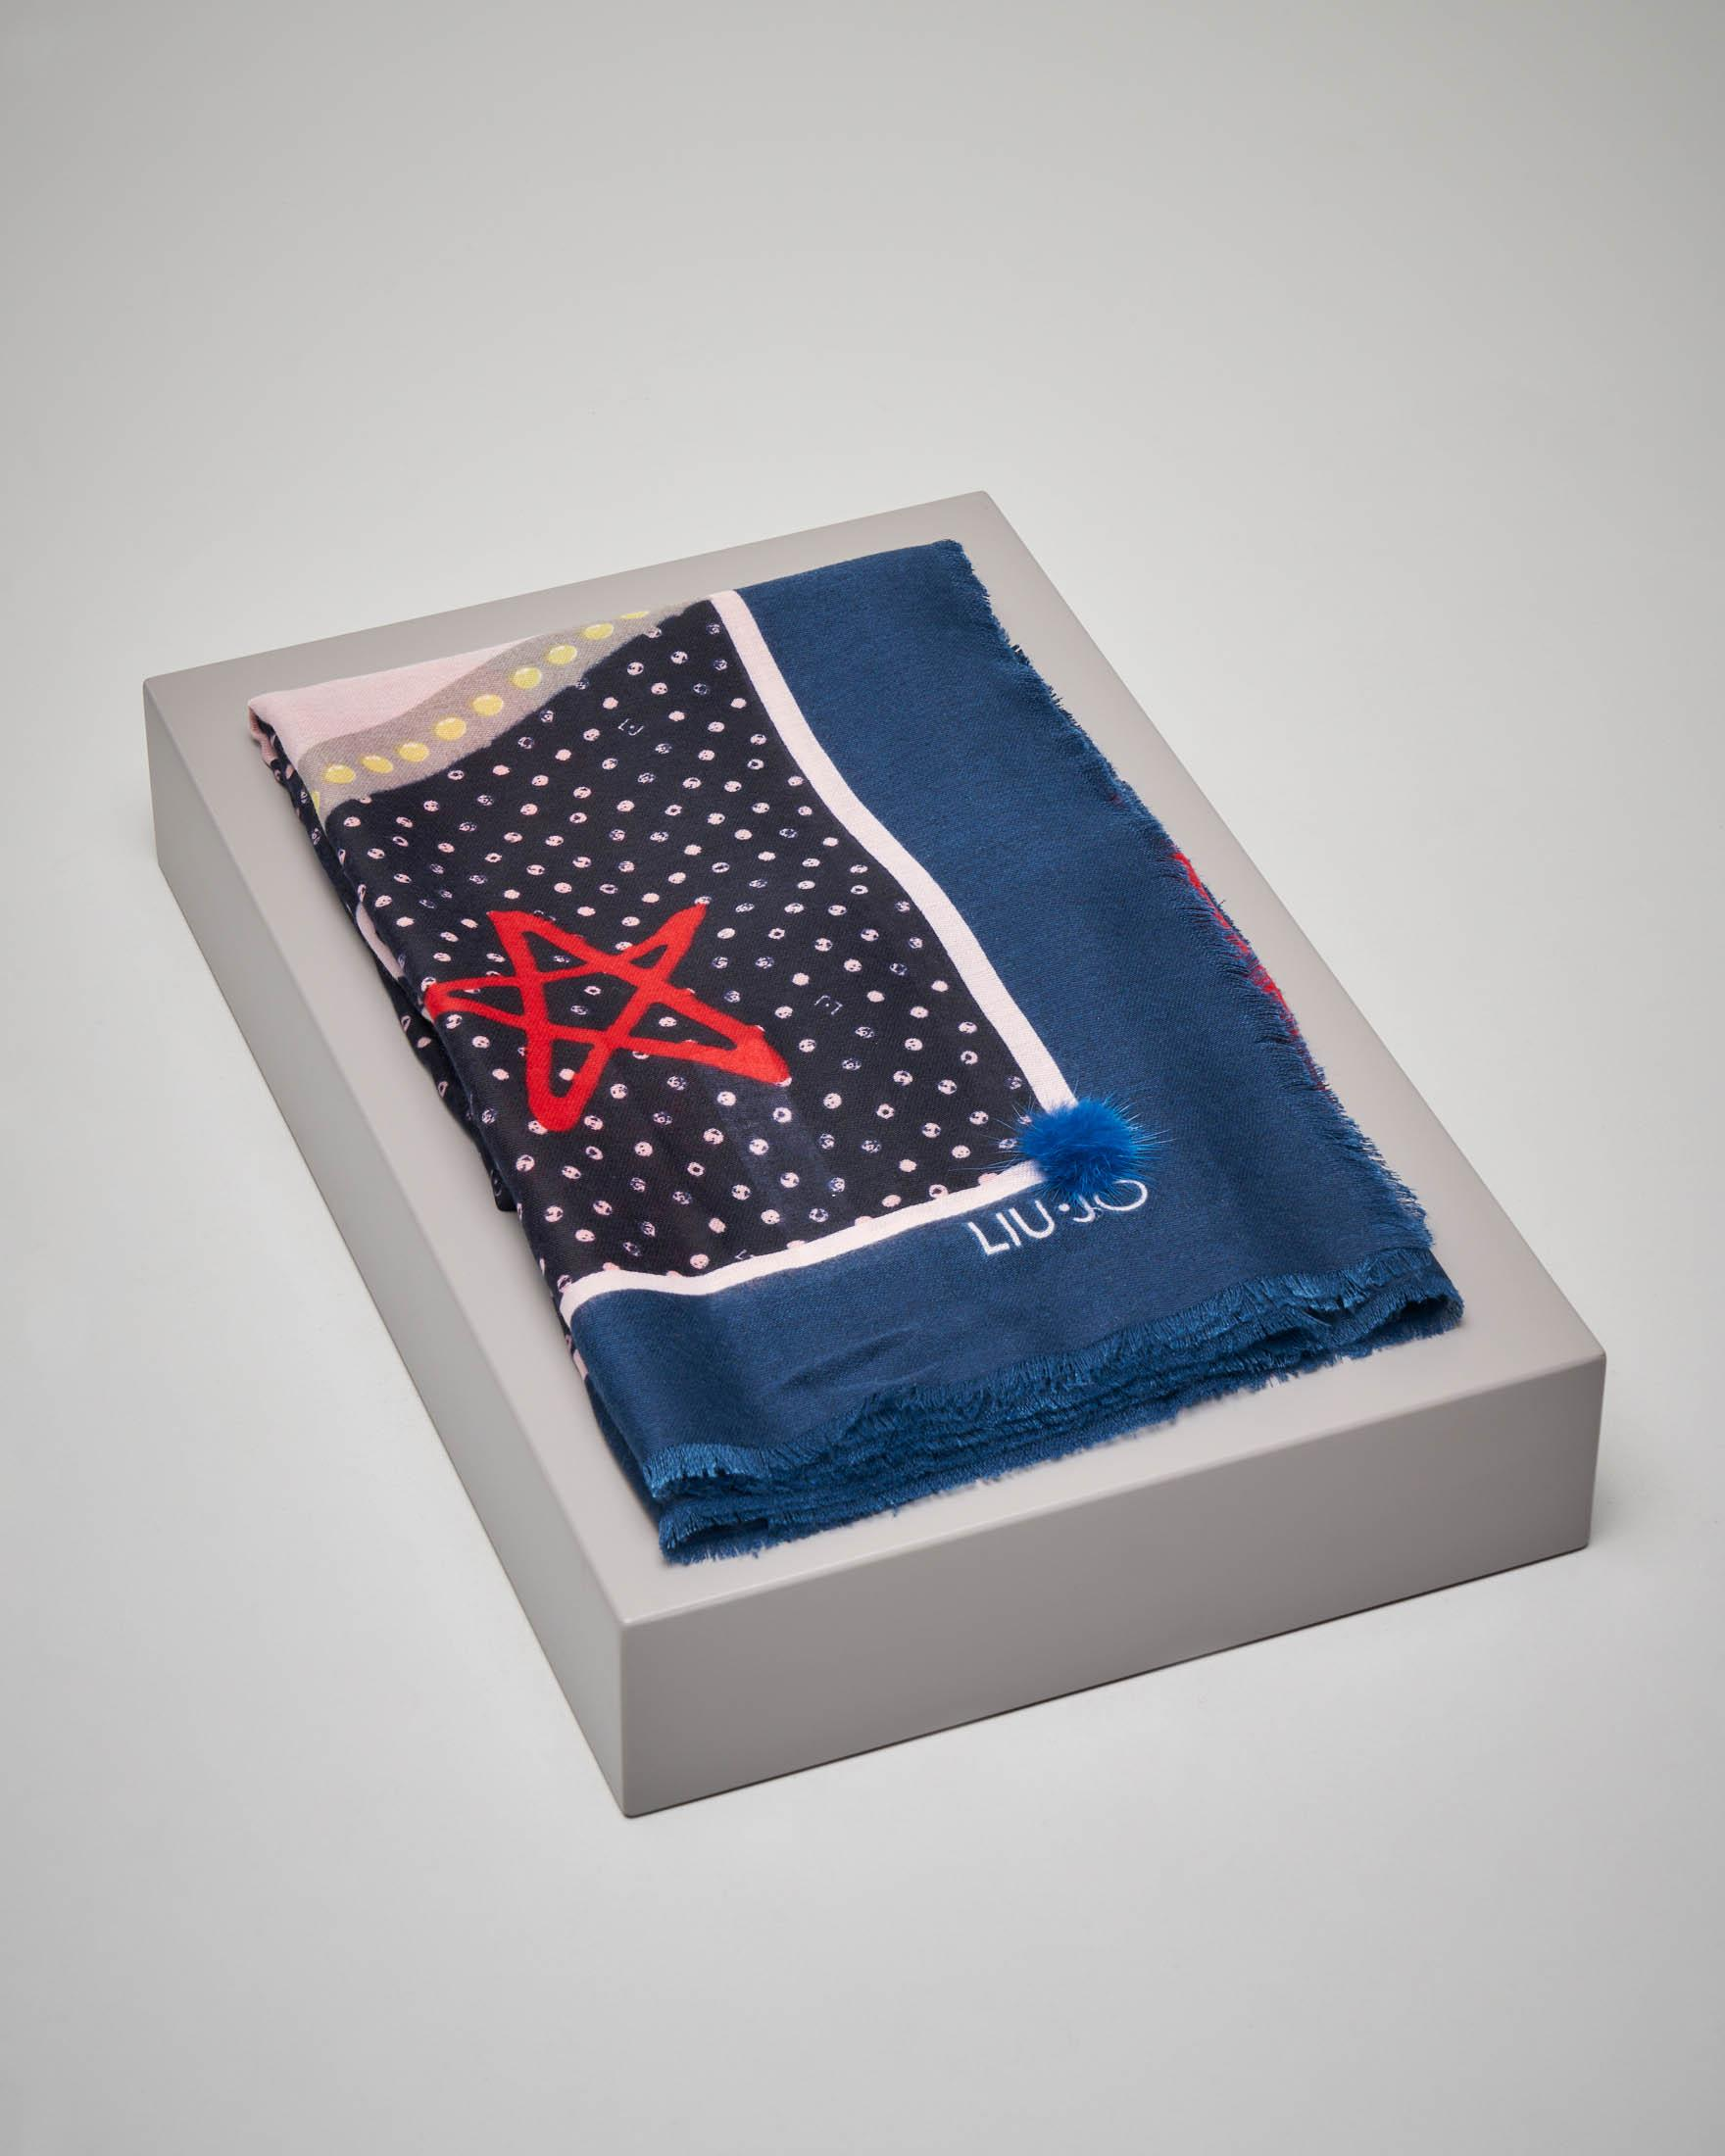 Maxi foulard fantasia logo con riquadro blu e pon pon in pelliccia